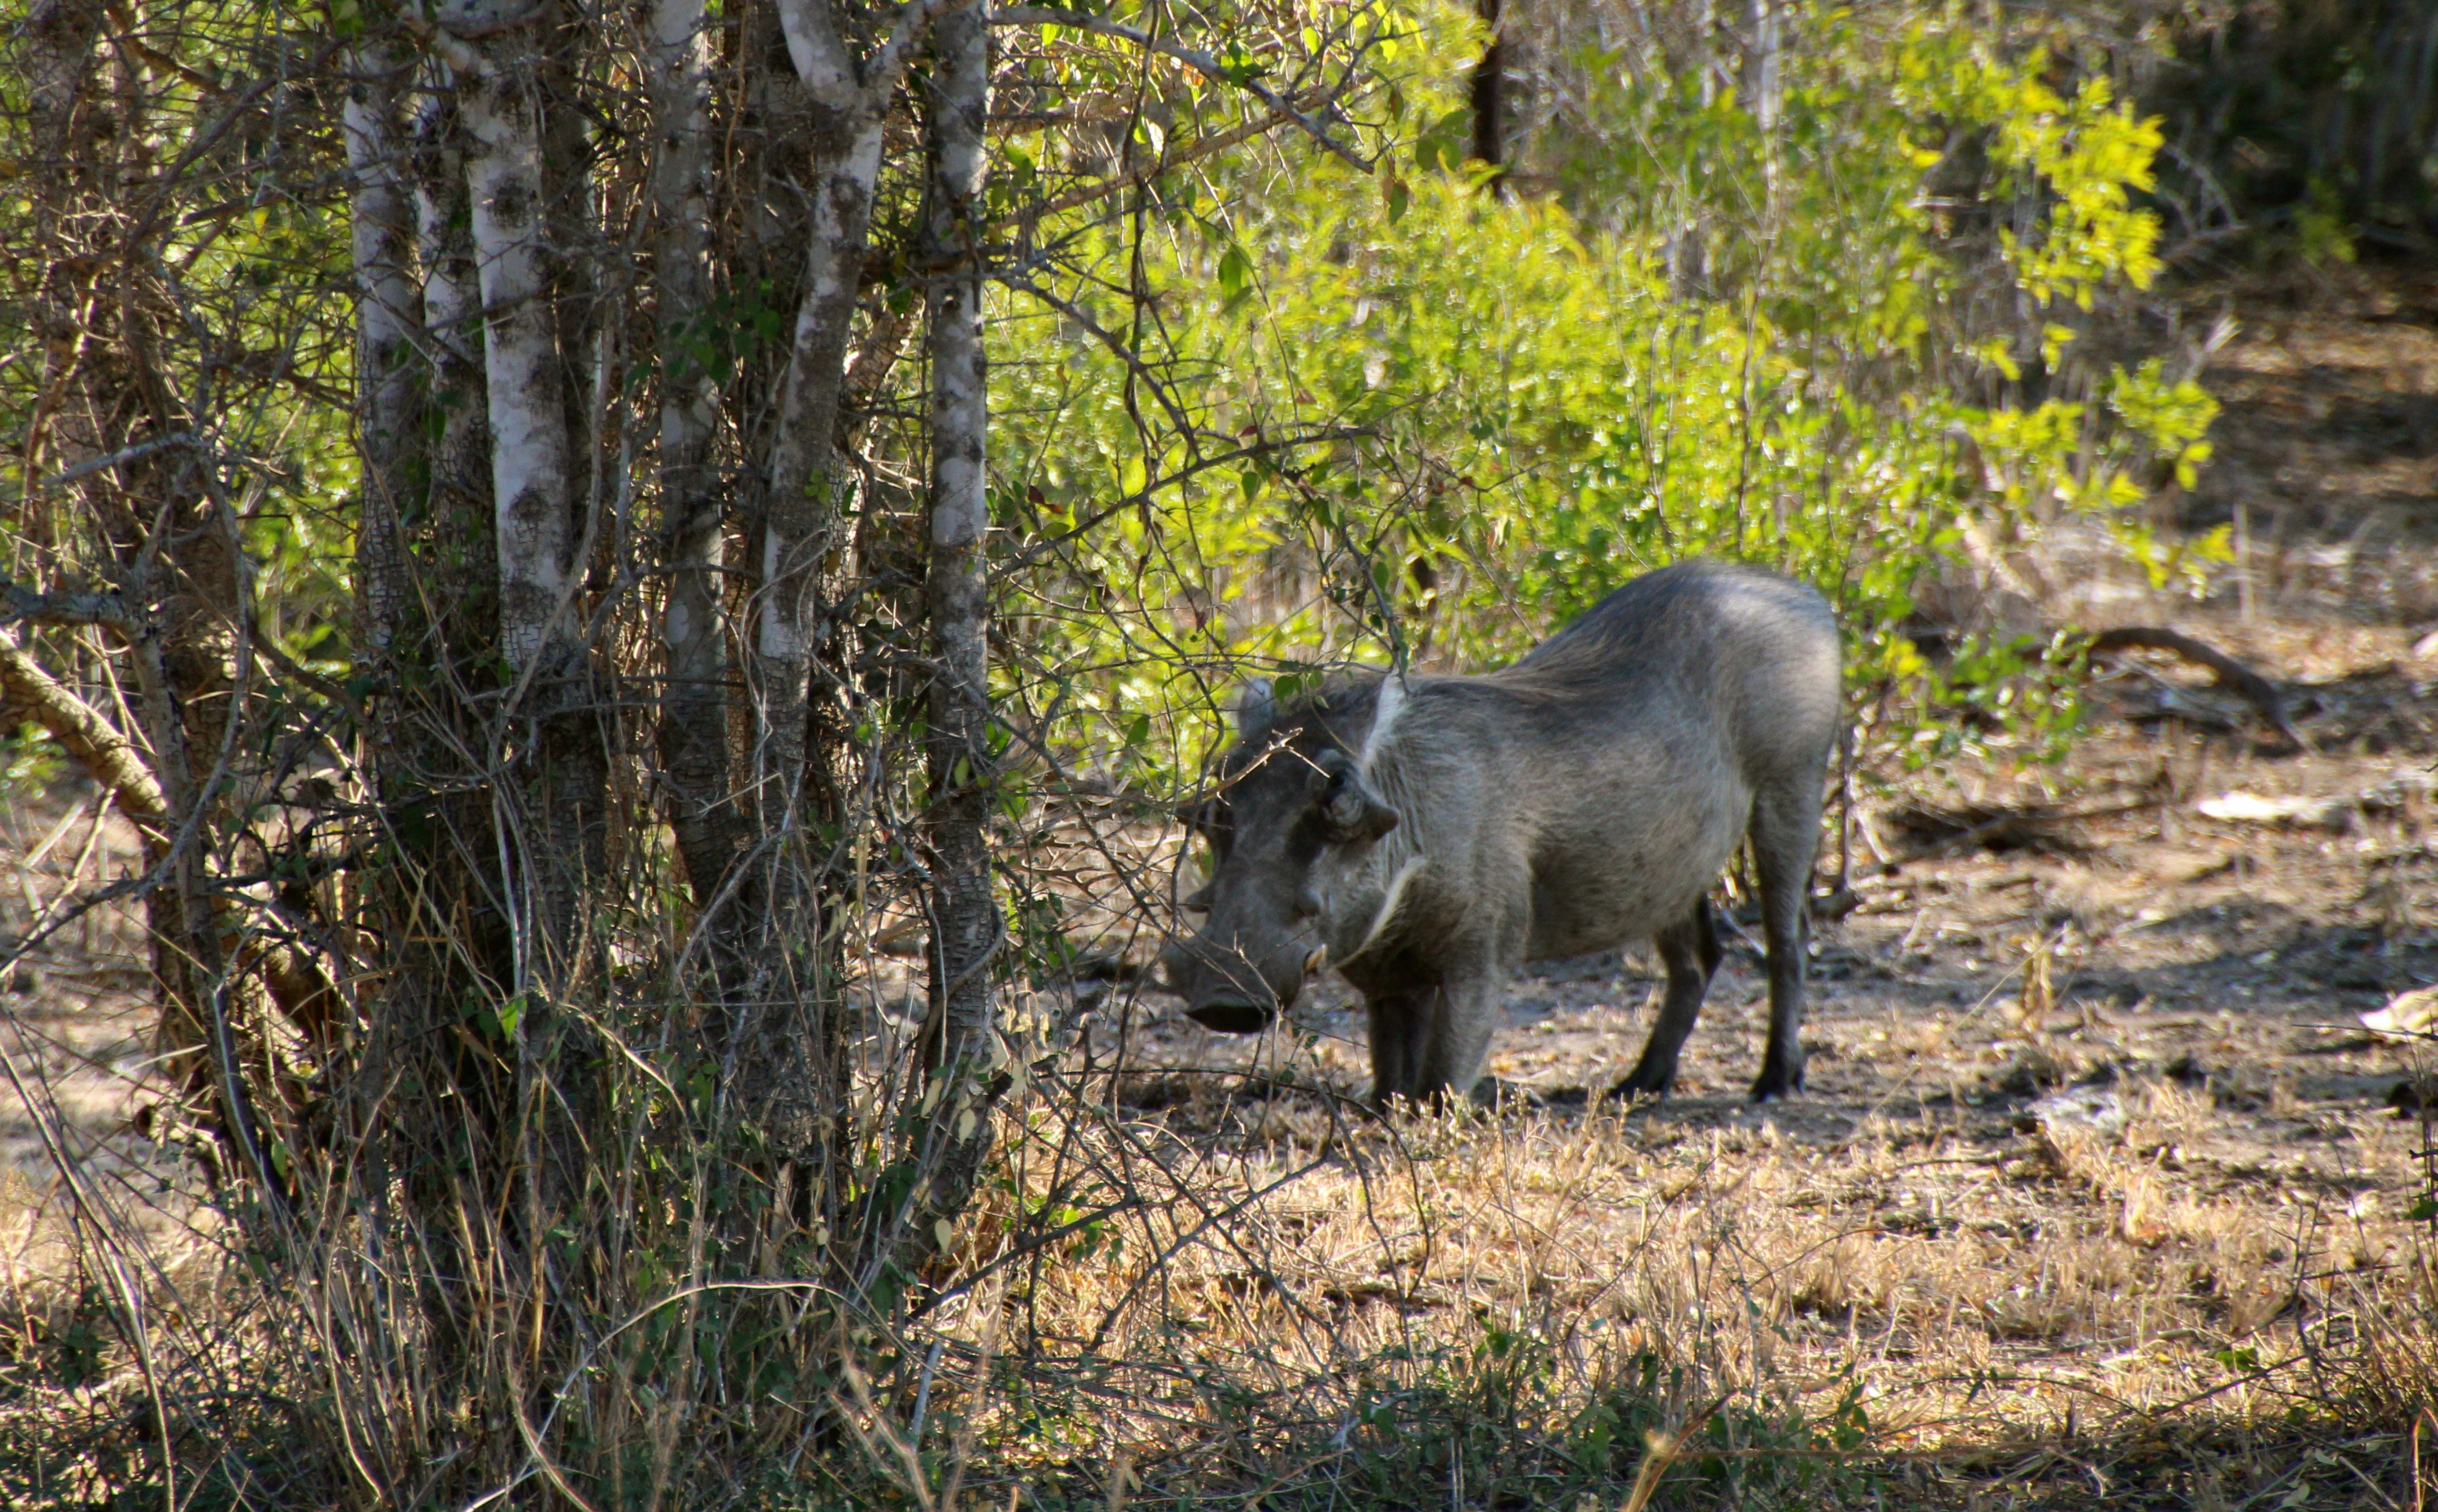 Sabi Sands South Africa Warthog